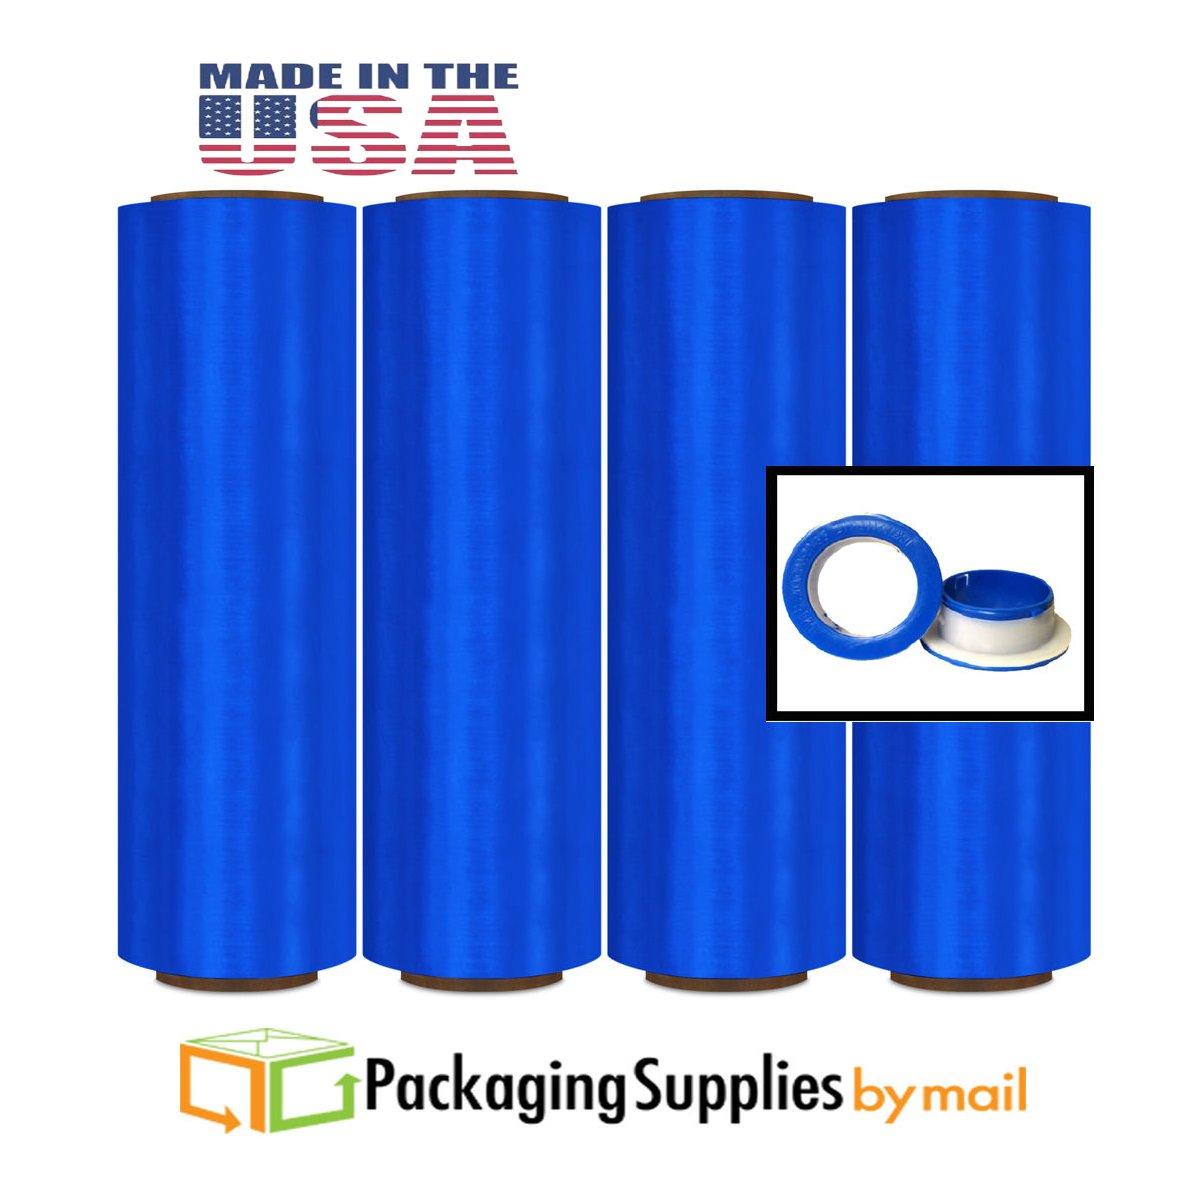 (8 Rolls) Blue Color Pre-Stretch Wrap Film w/Folded Edges 17'' x 1476' 8.5 Mic. (32 Ga) + Free Dispenser